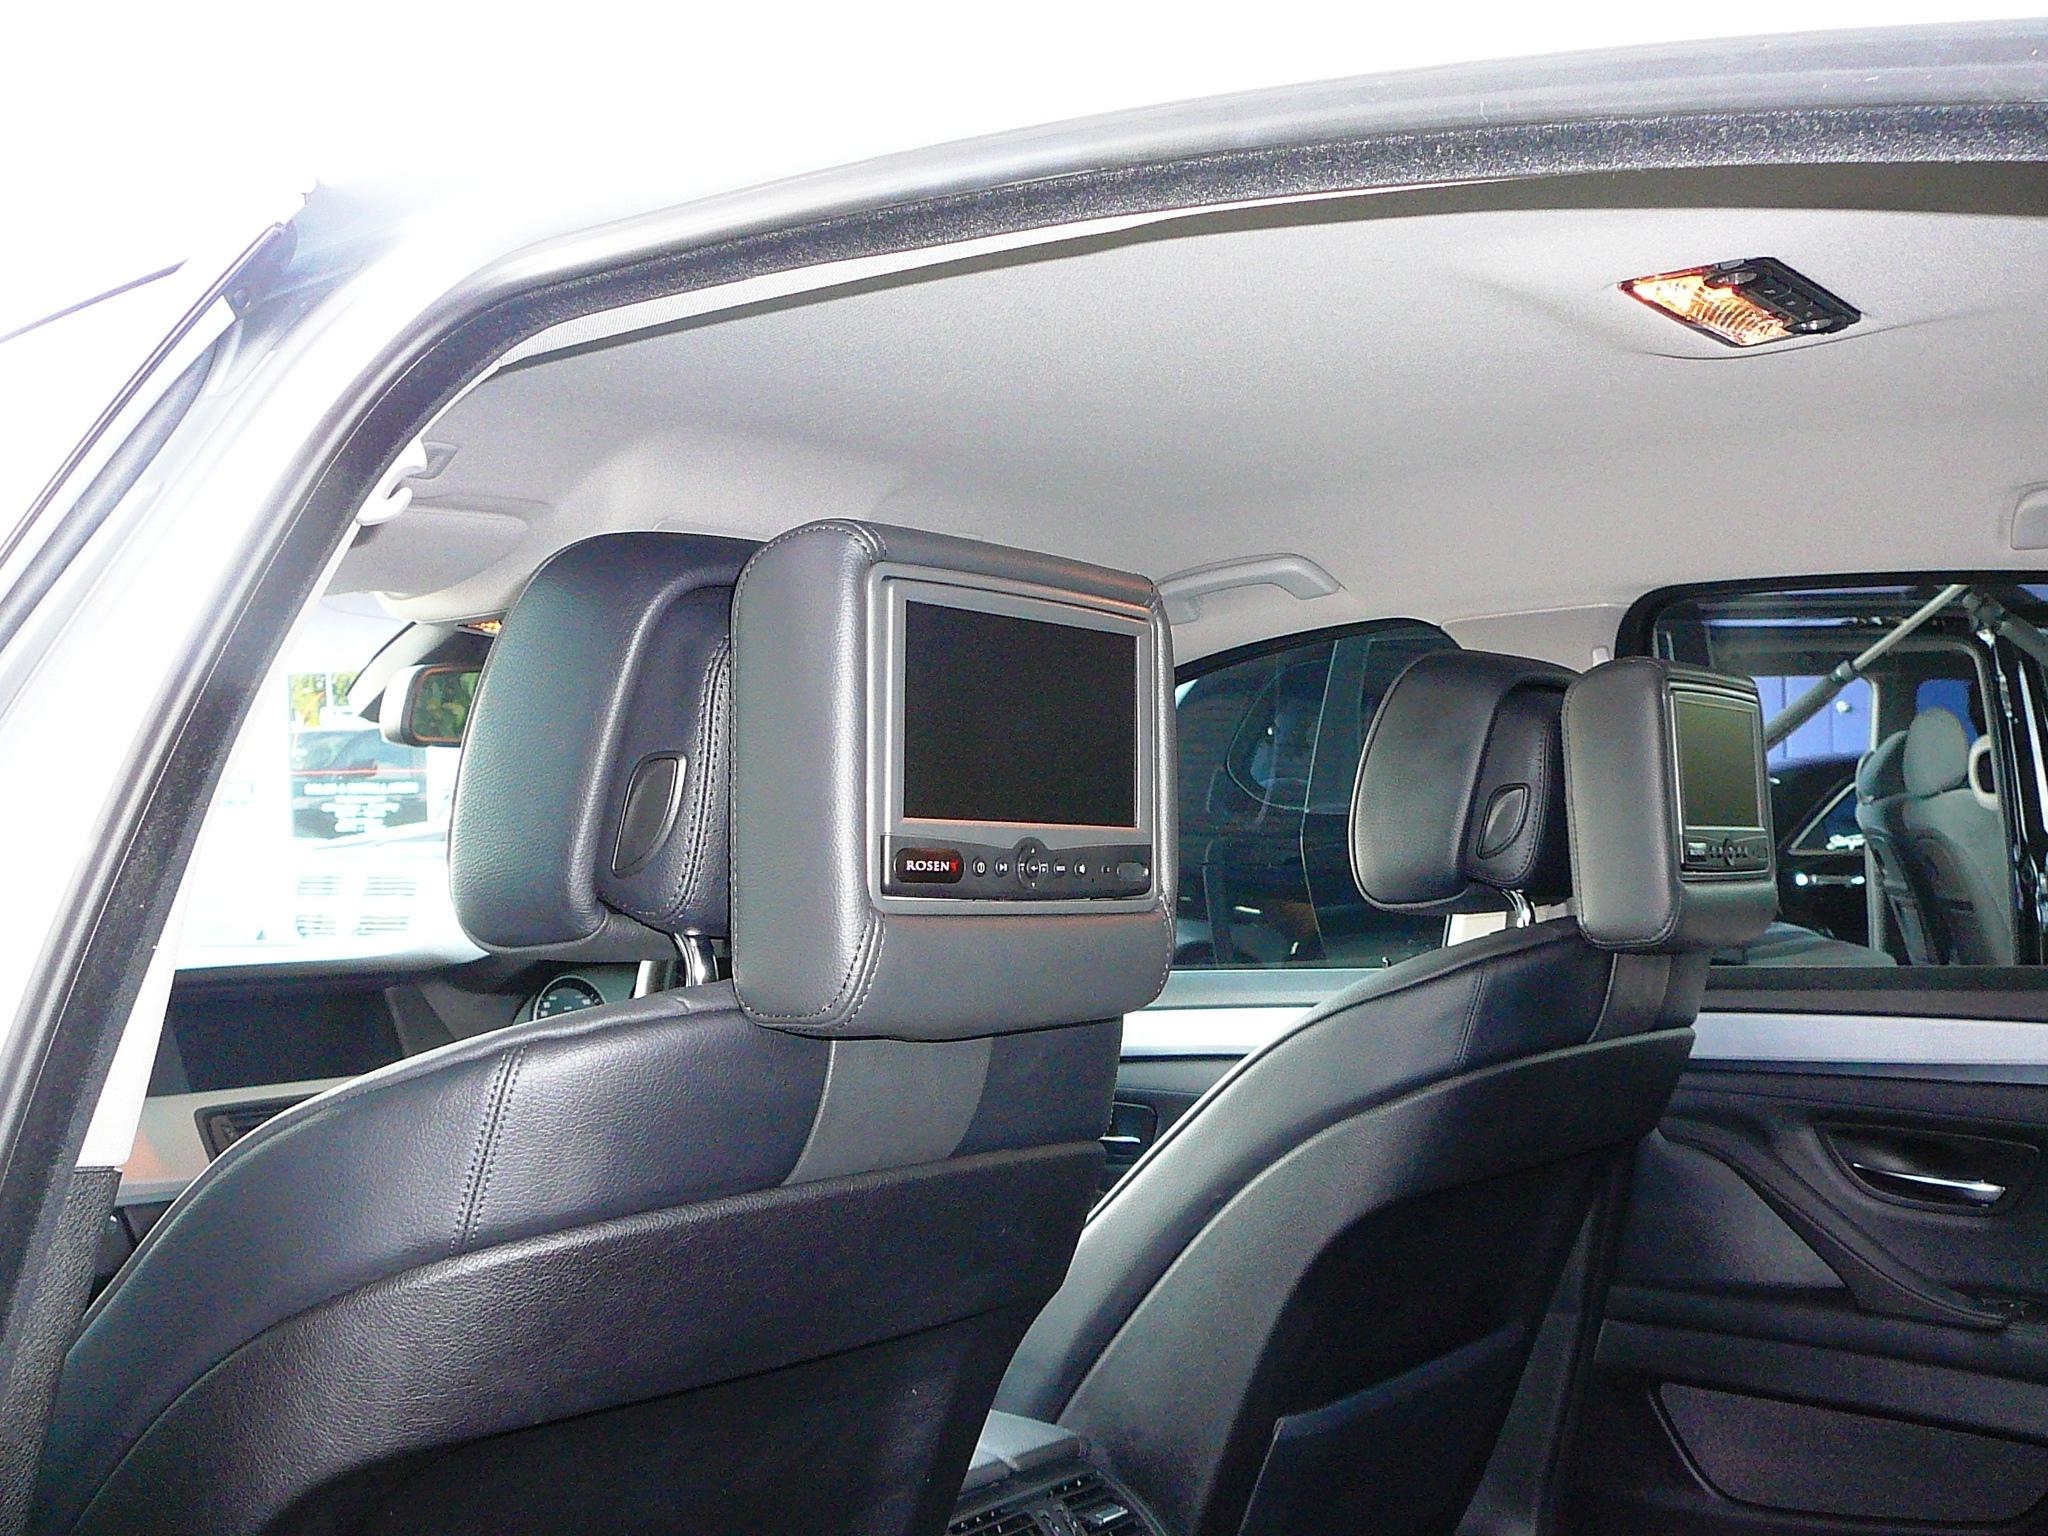 BMW 528i 2010, Rosen AV 7500 rear seat DVD solution.